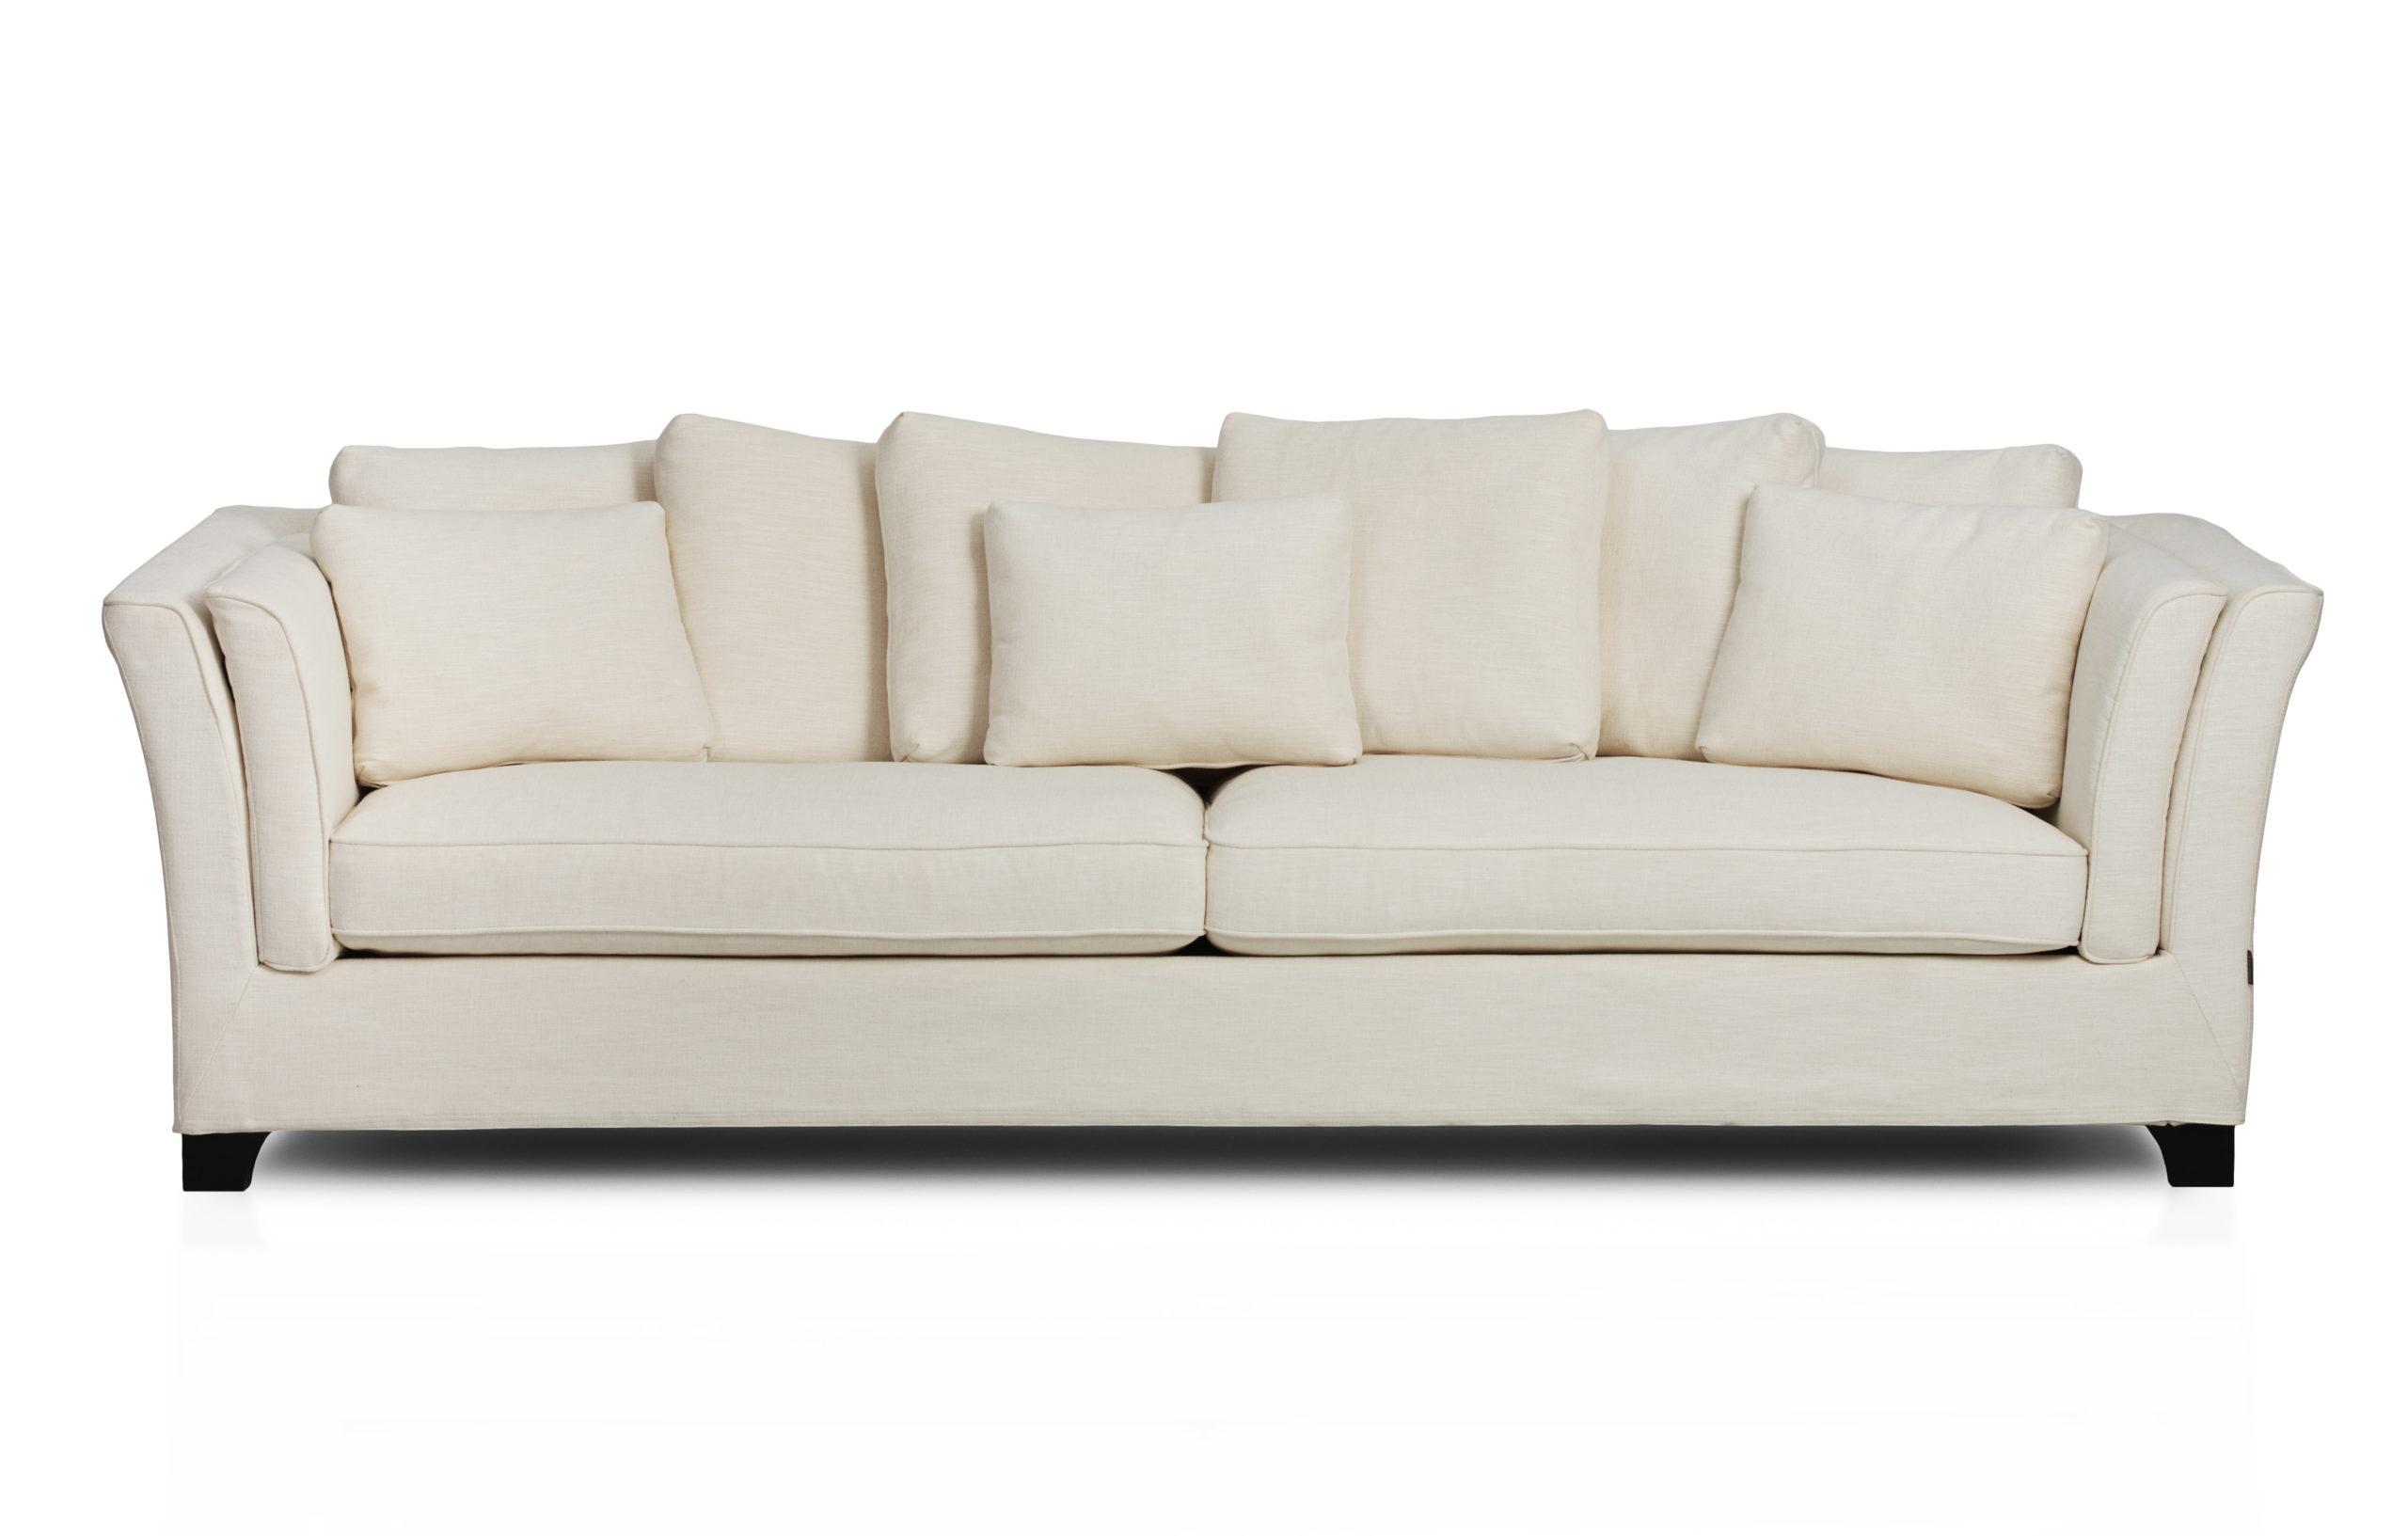 Sofa Fama MTI Furninova